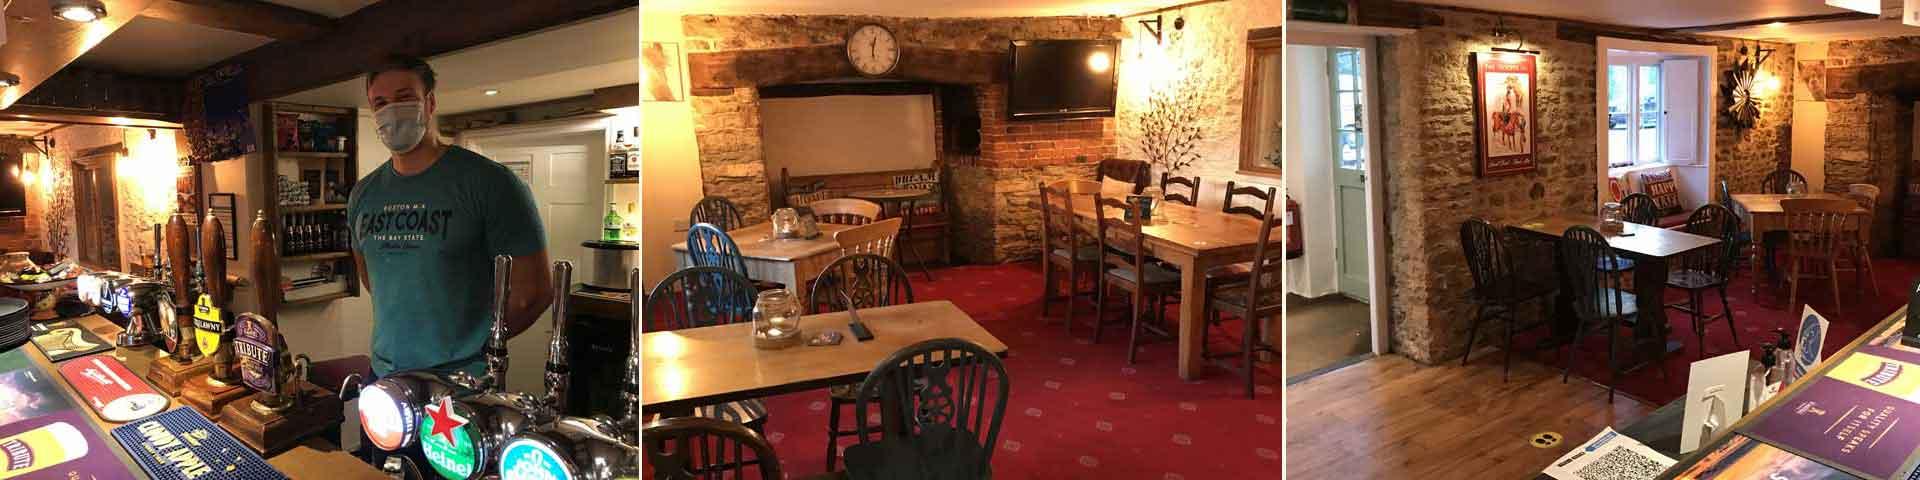 Inside Pub 2020